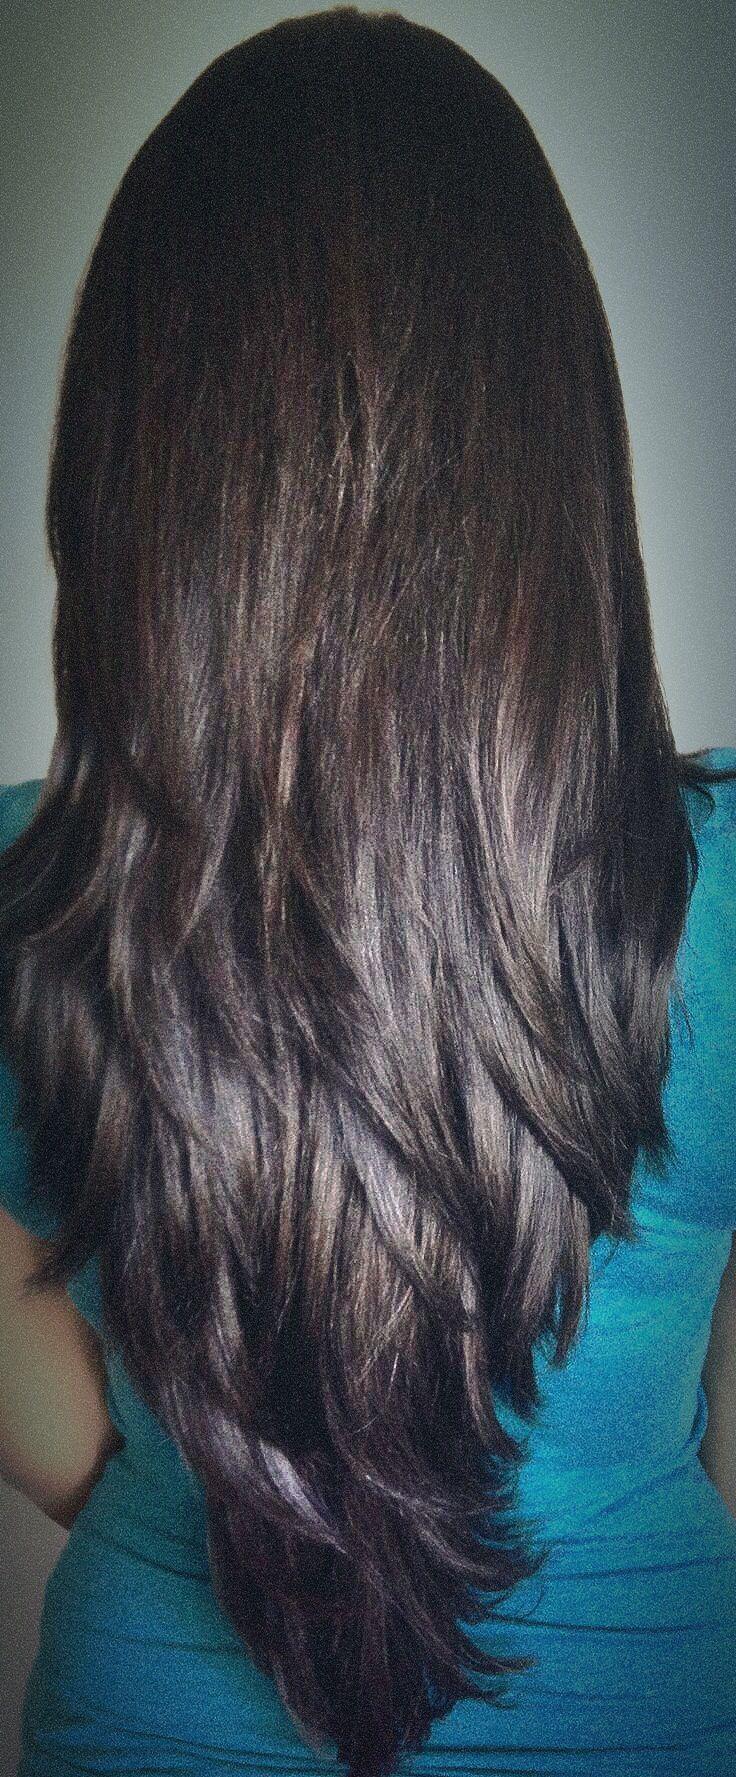 Awe Inspiring 1000 Ideas About Long Layered Haircuts On Pinterest Haircuts Short Hairstyles Gunalazisus